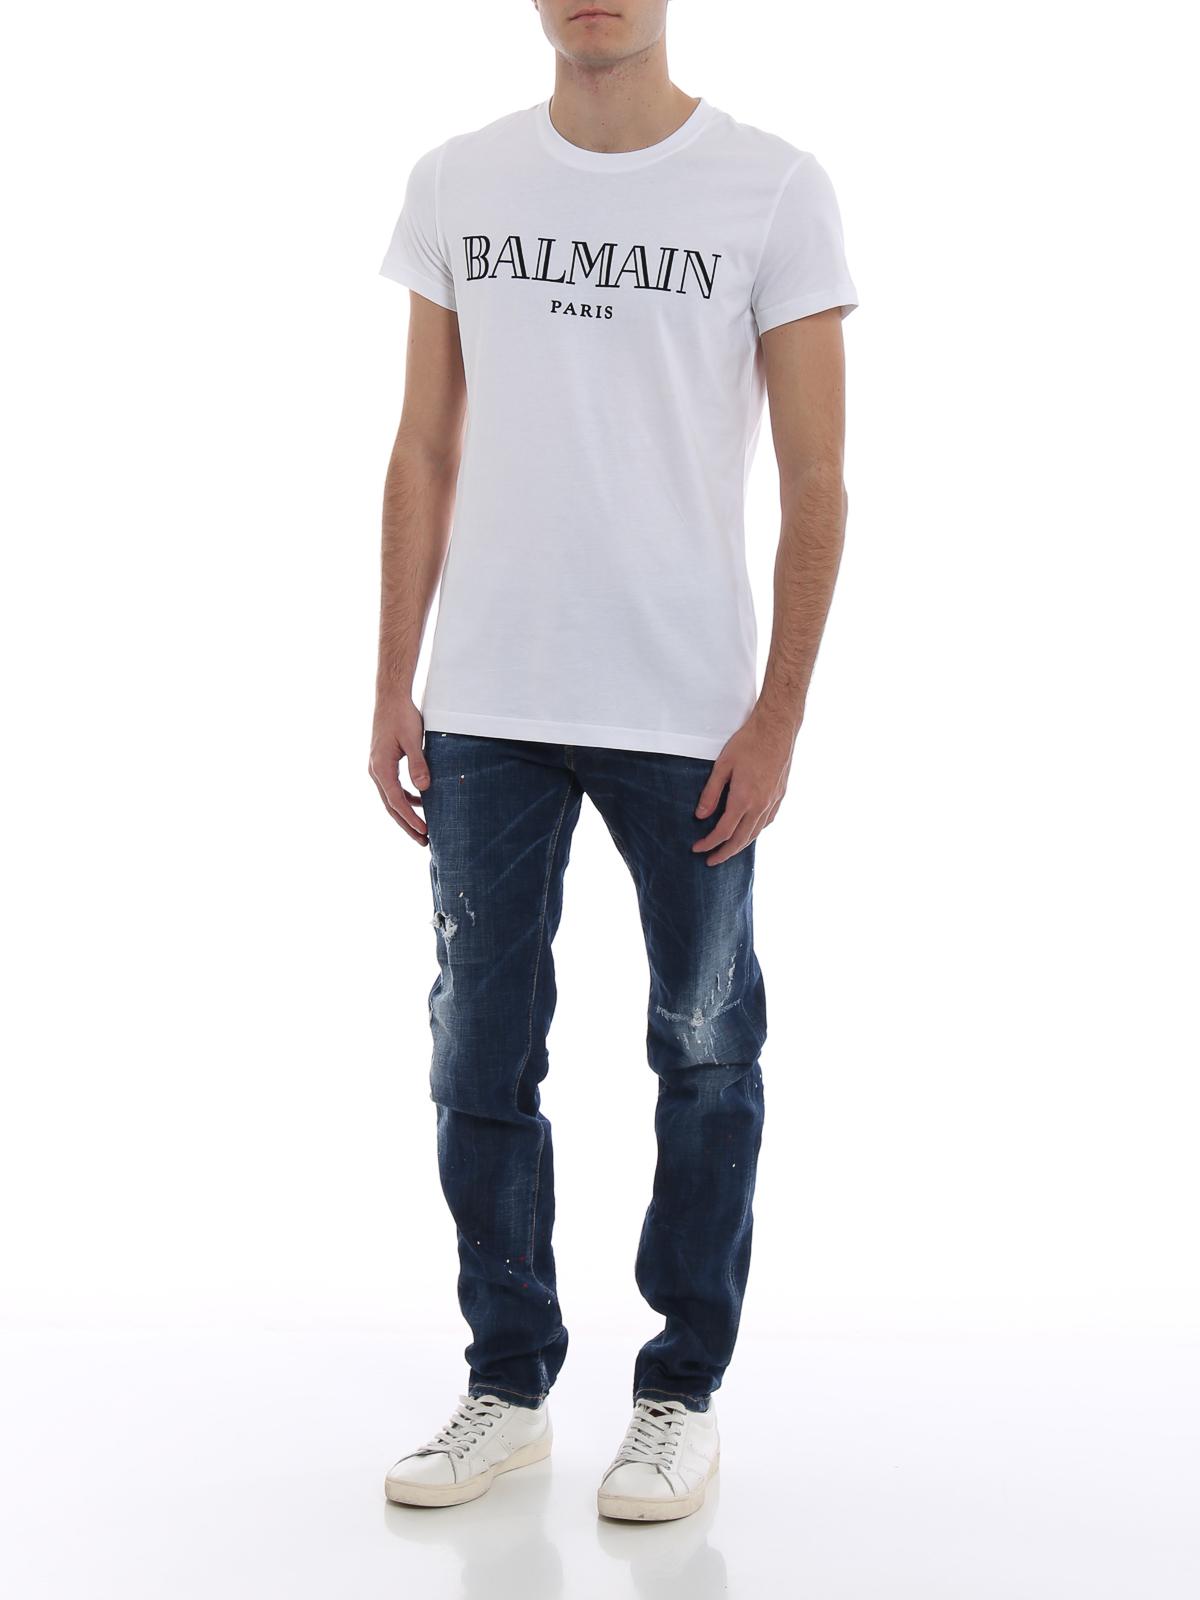 a6fec5e3c Balmain: t-shirts online - Balmain Paris velvet logo cotton T-shirt